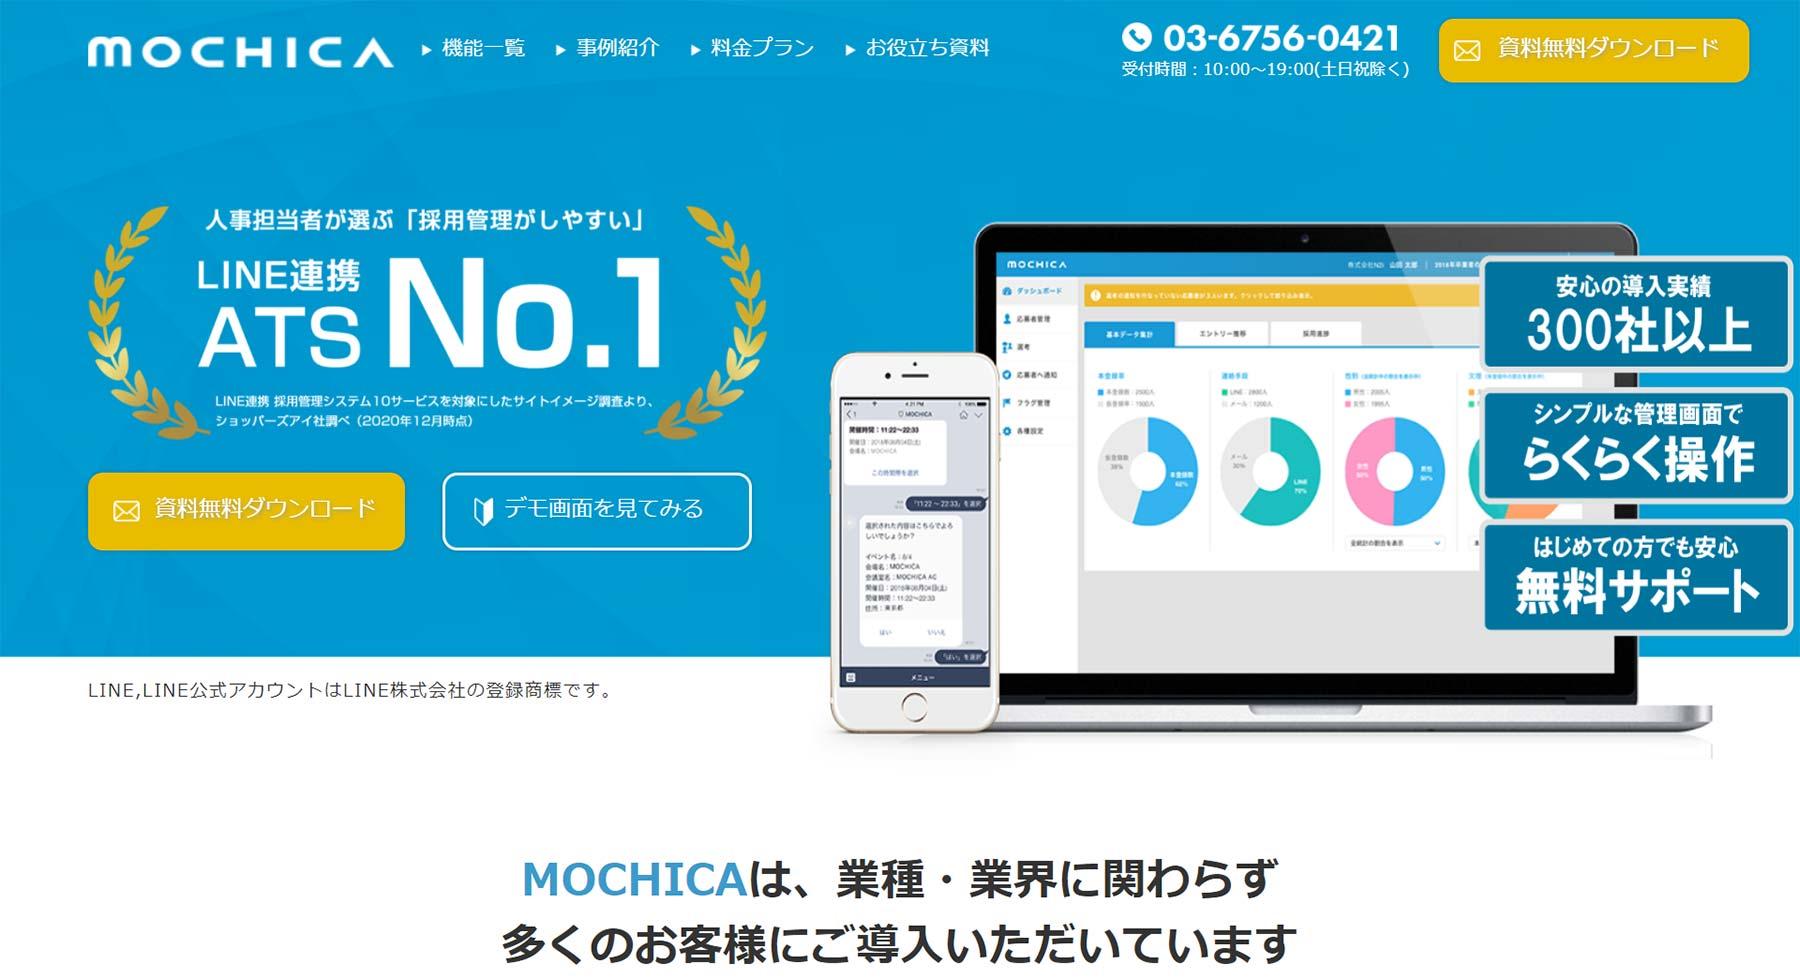 MOCHICA公式Webサイト